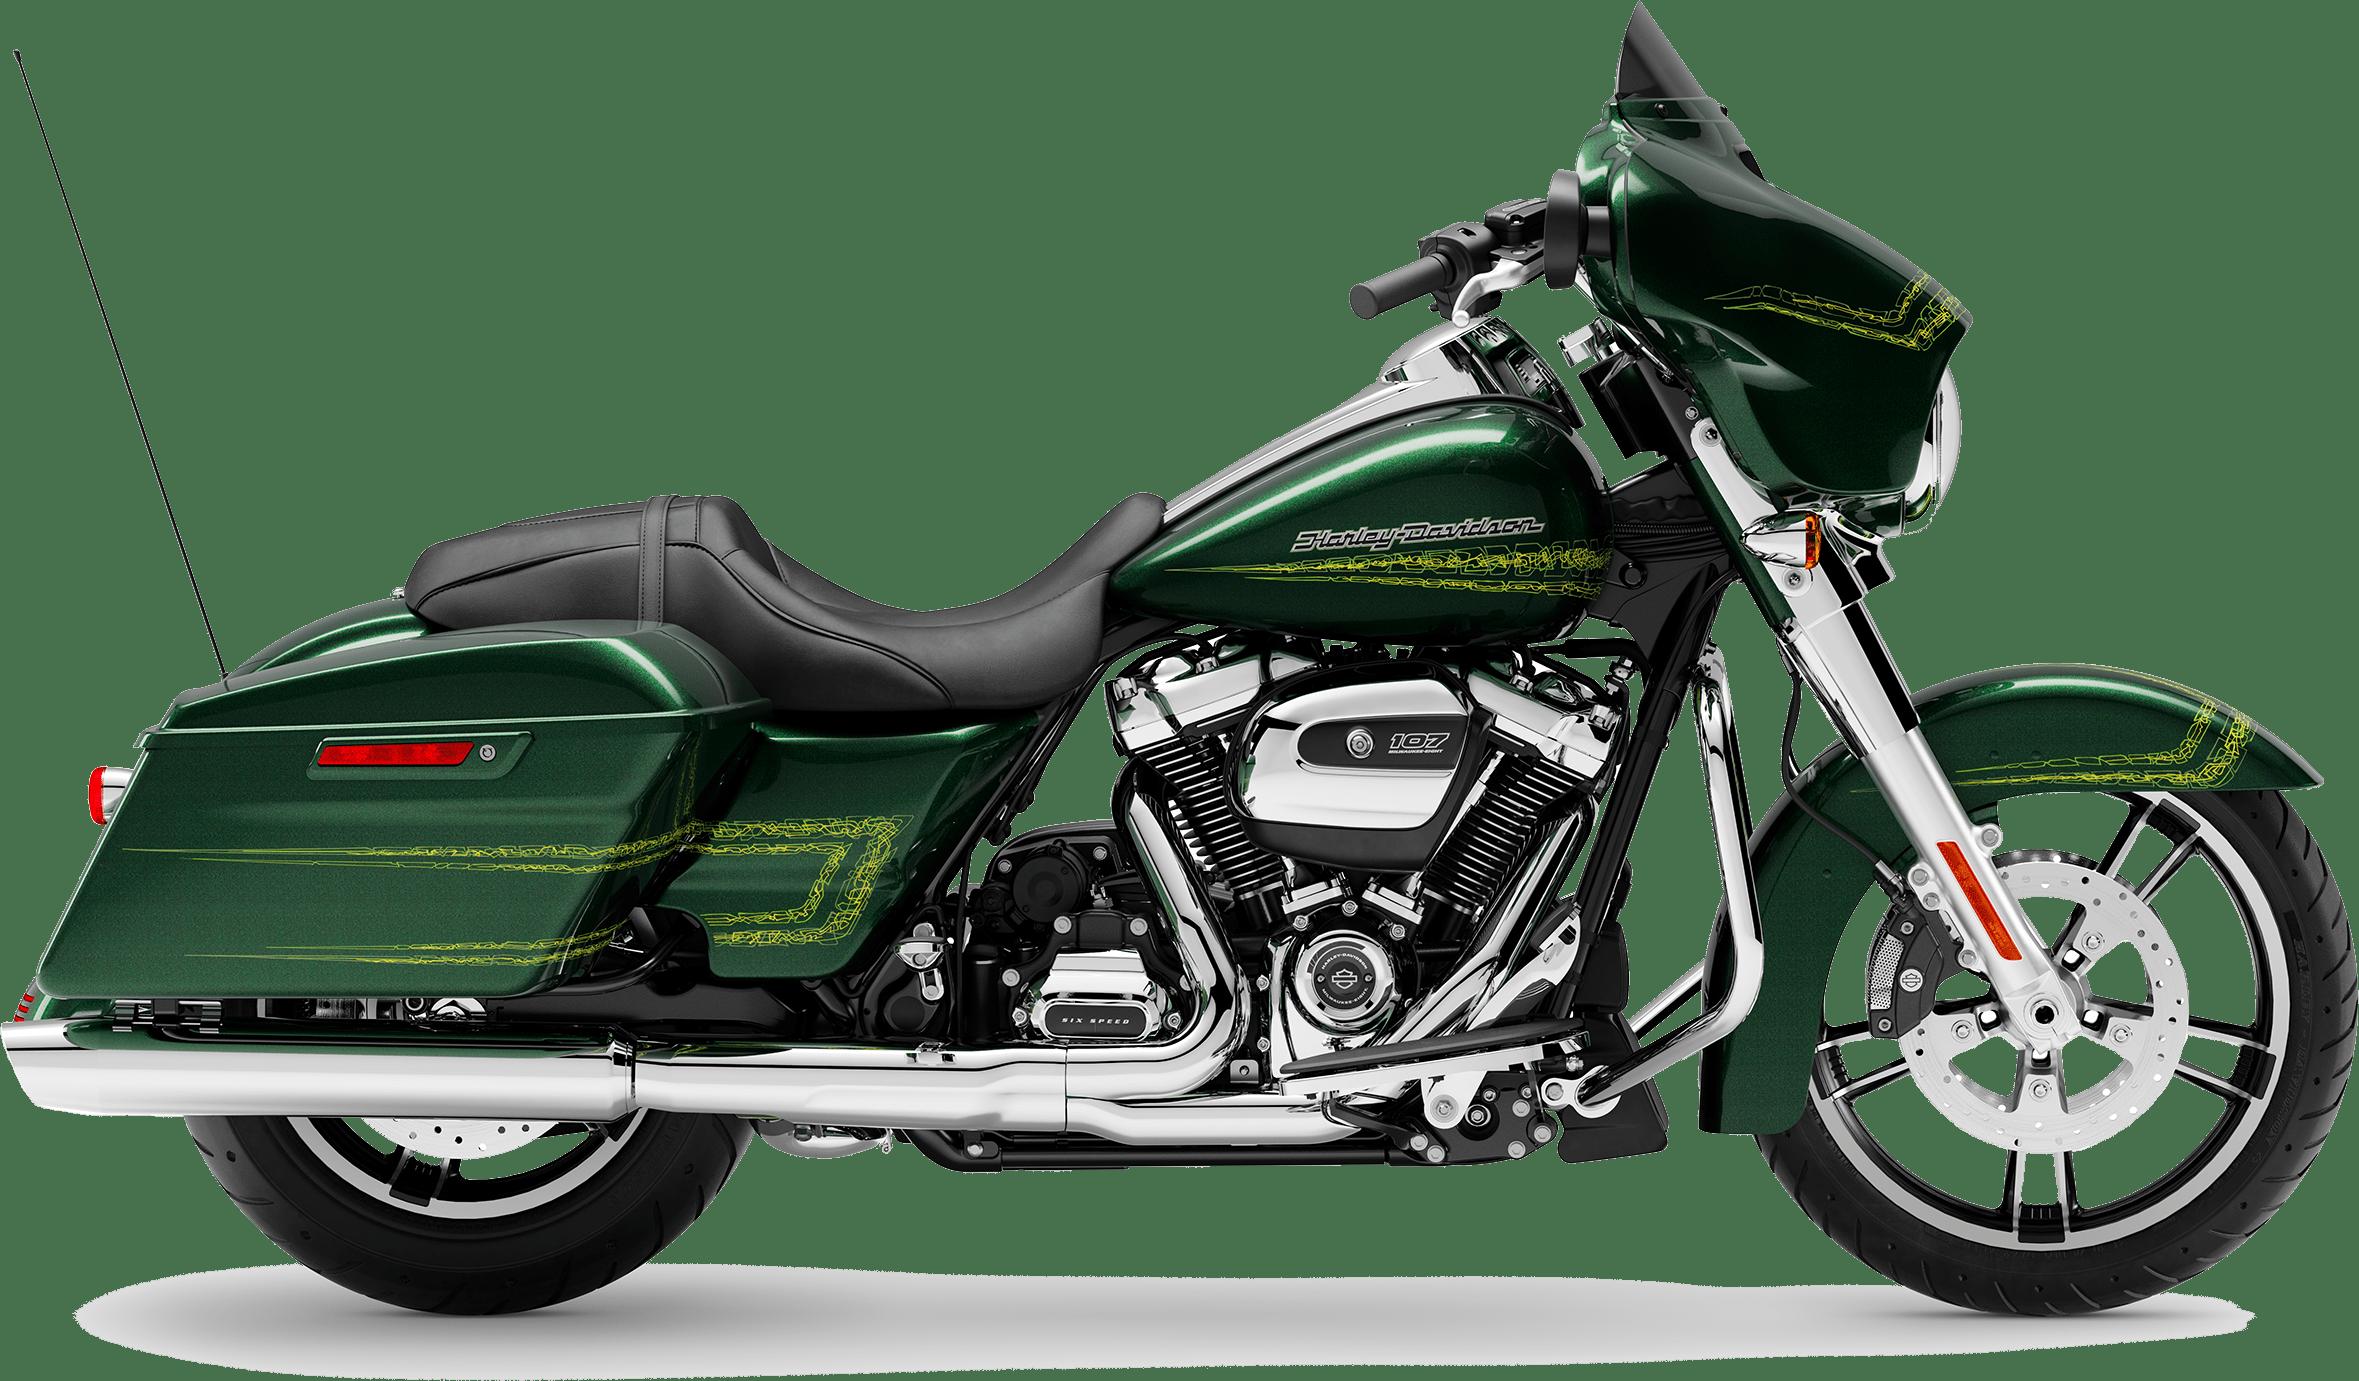 2019 Harley-Davidson H-D Touring Street Glide Kinetic Green